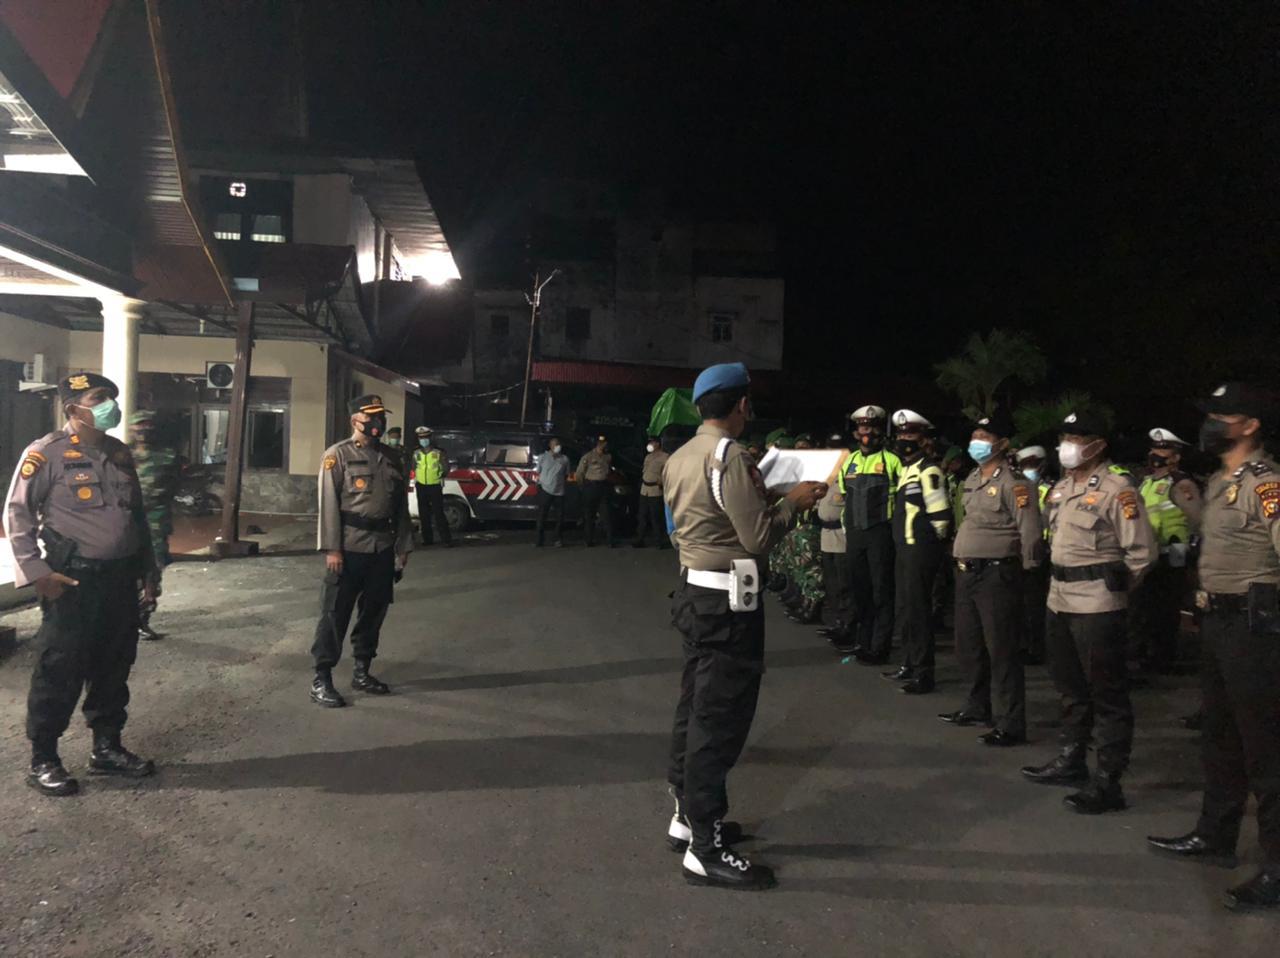 TNI Polri Gelar Razia Gabungan di Kota Tembilahan, Ini Sasarannya